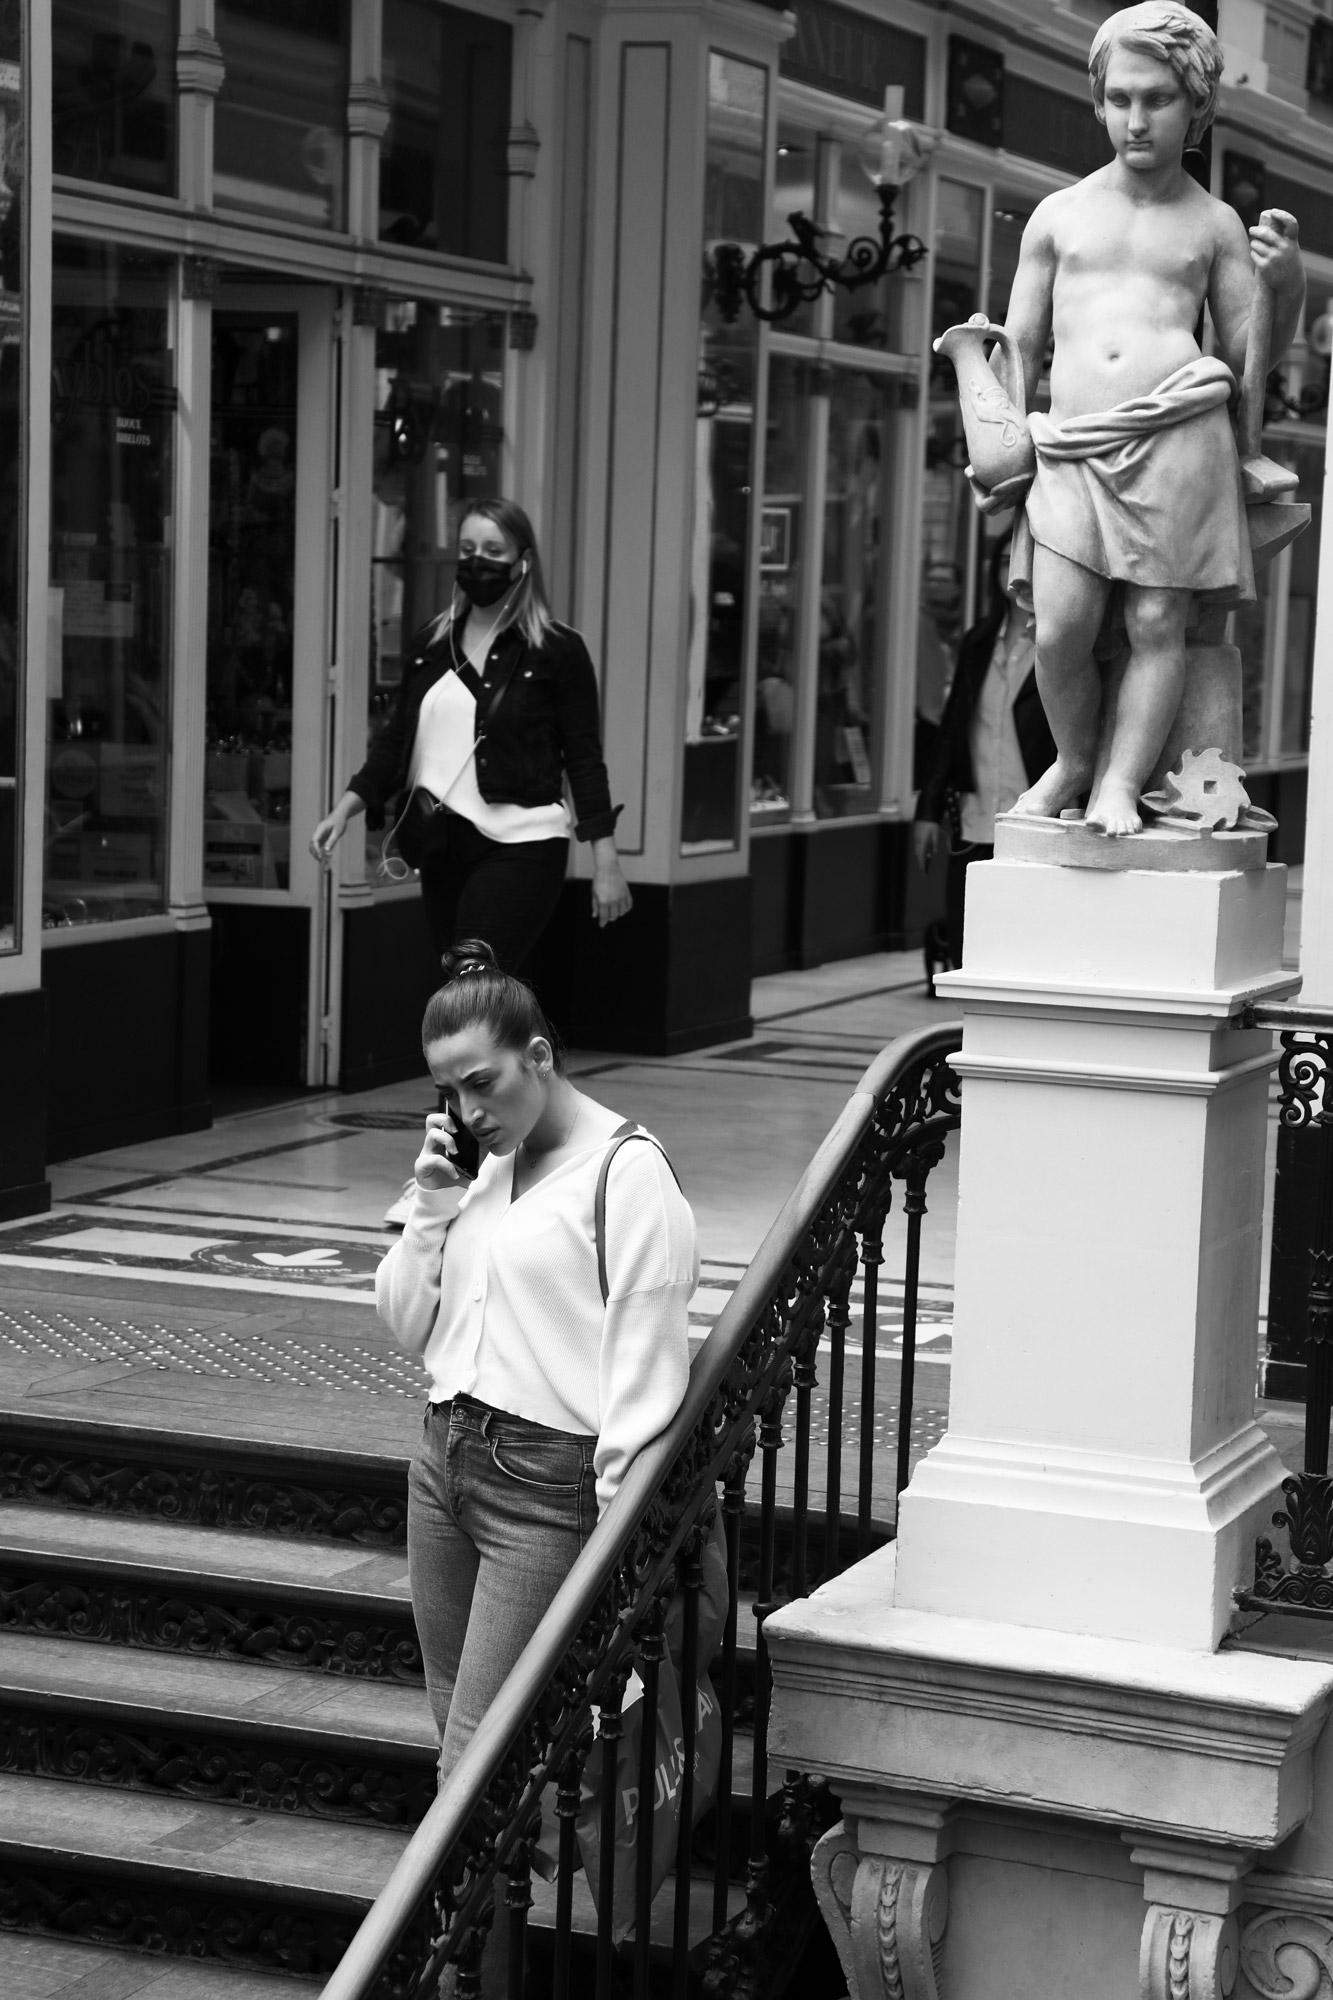 """Hello"" - Passage Pommeraye, Nantes. ©Clémence Rougetet"